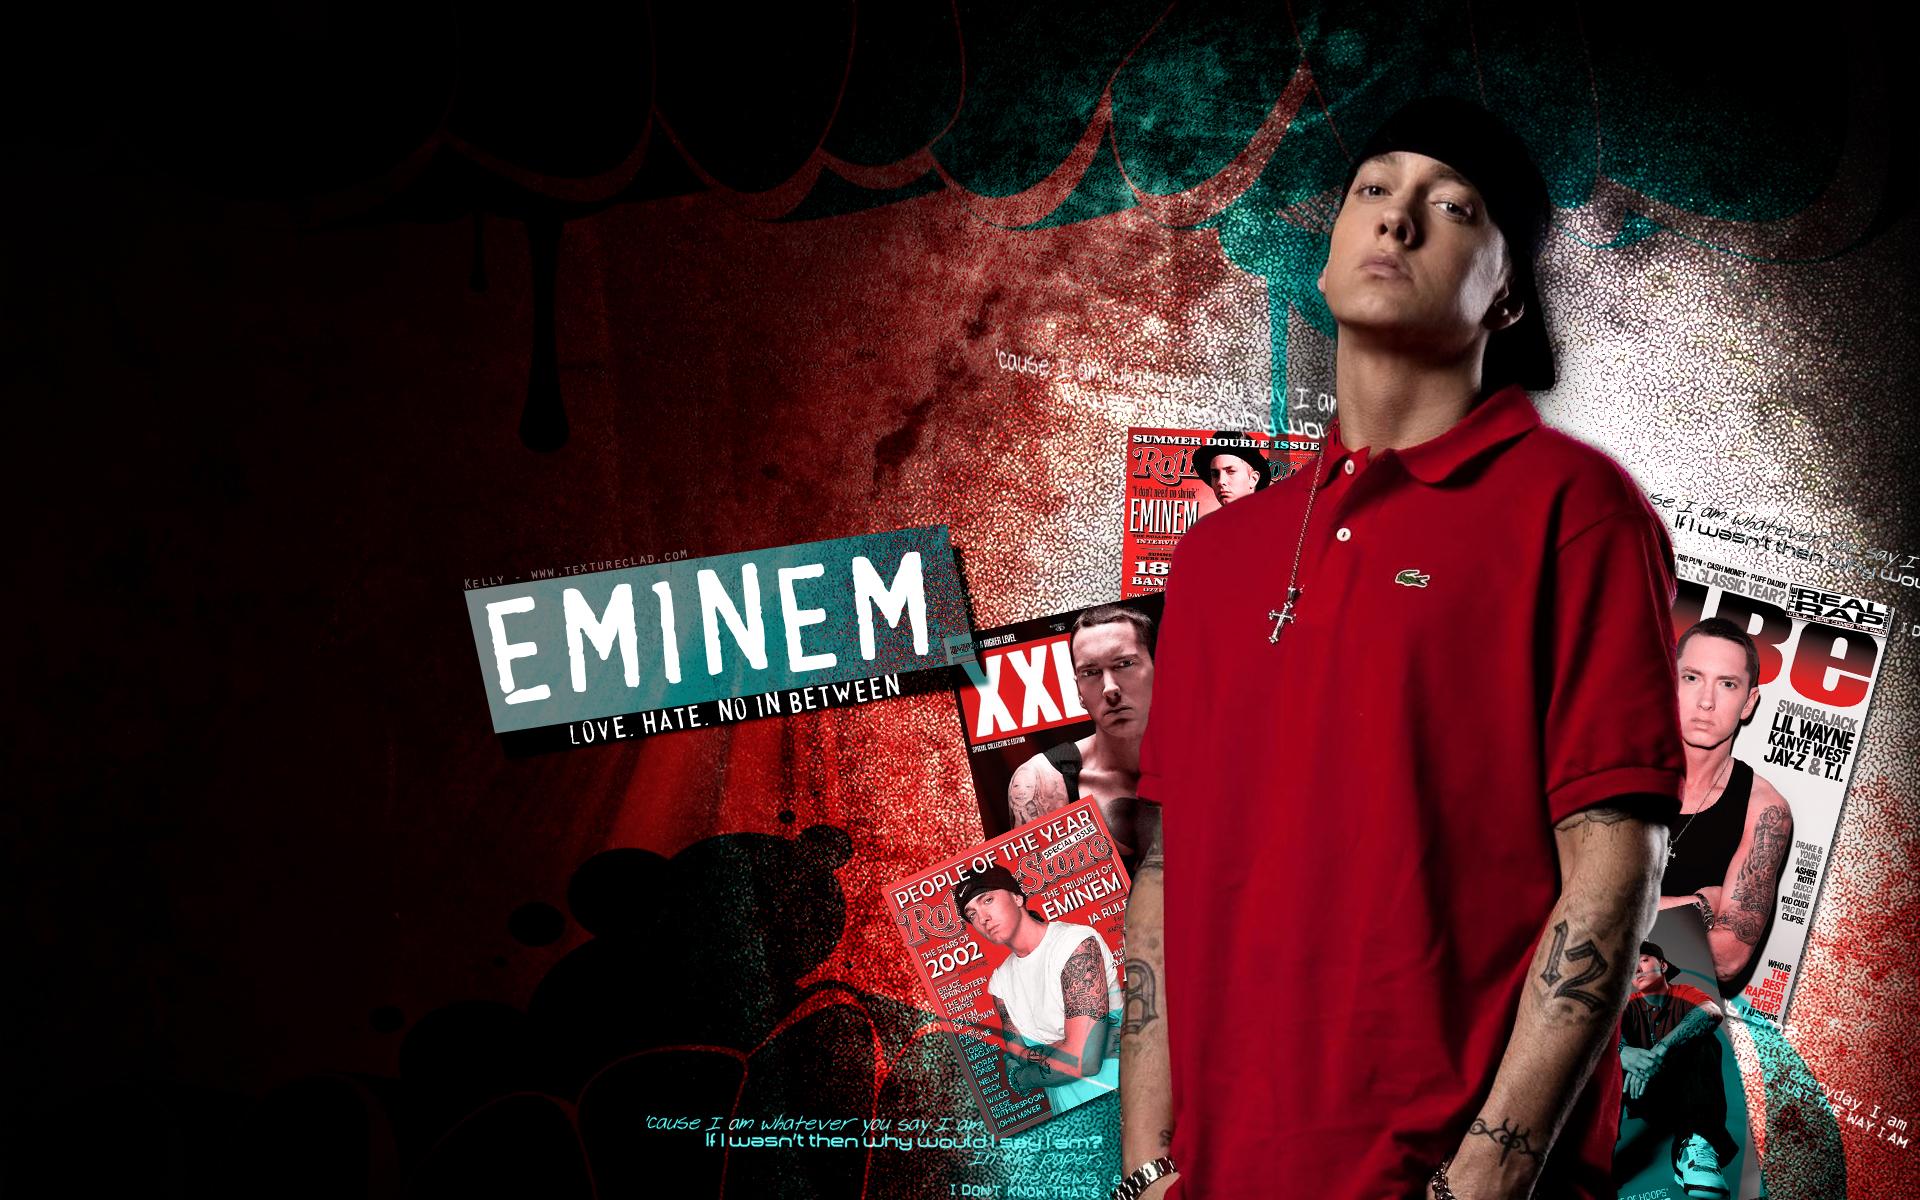 Eminem Wallpaper By Textureclad On Deviantart